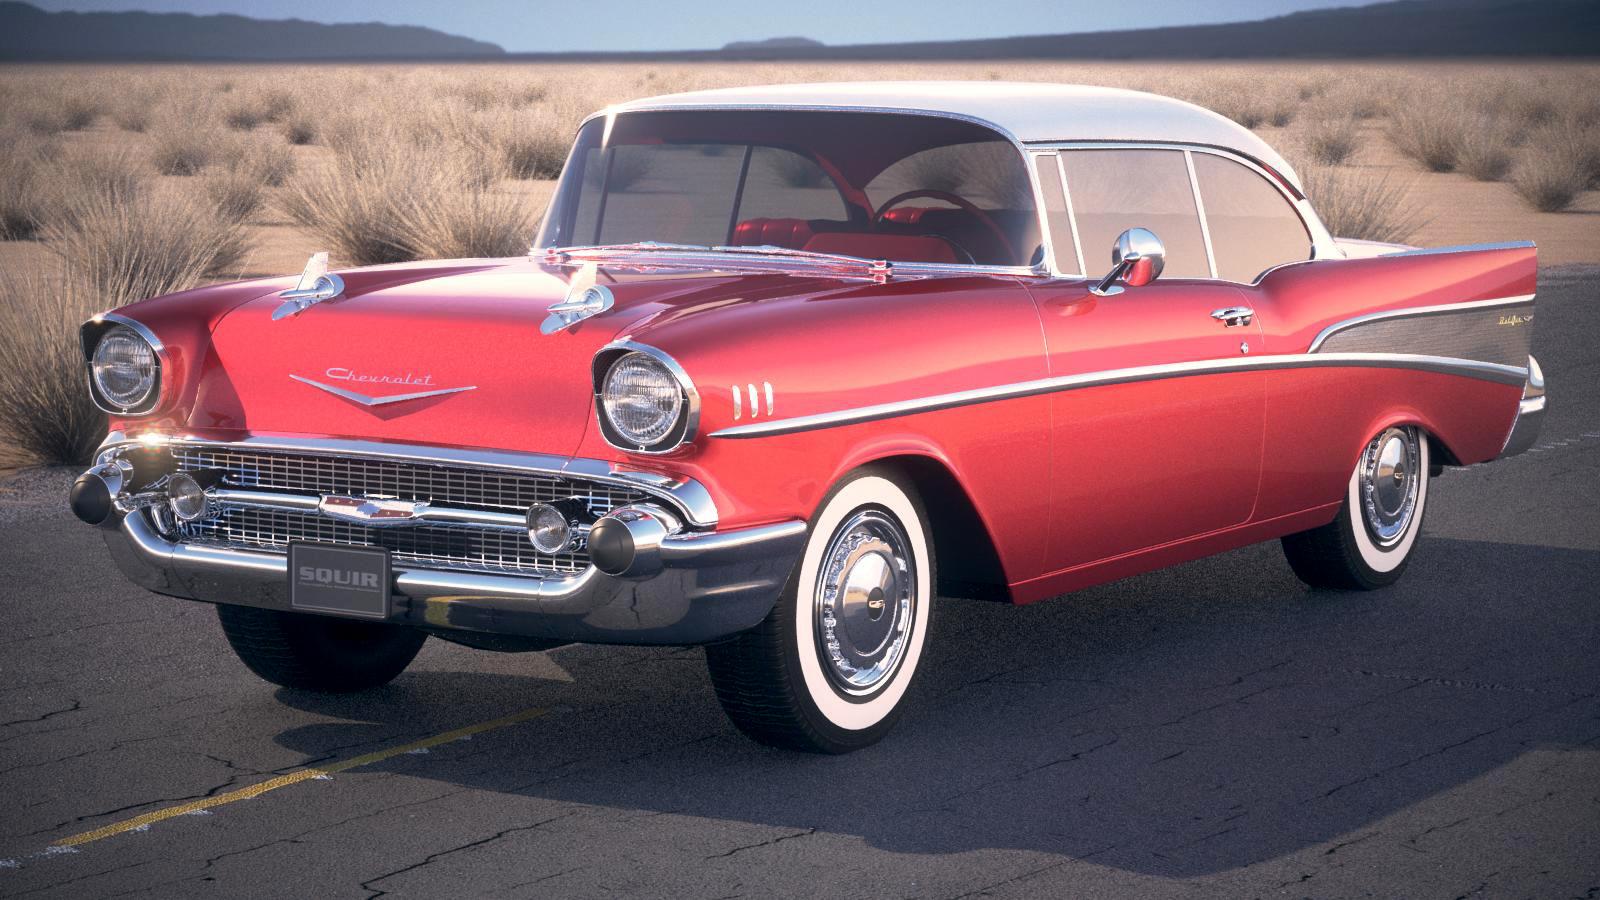 Chevrolet Bel Air >> Chevrolet Bel Air Hardtop Coupe 1957